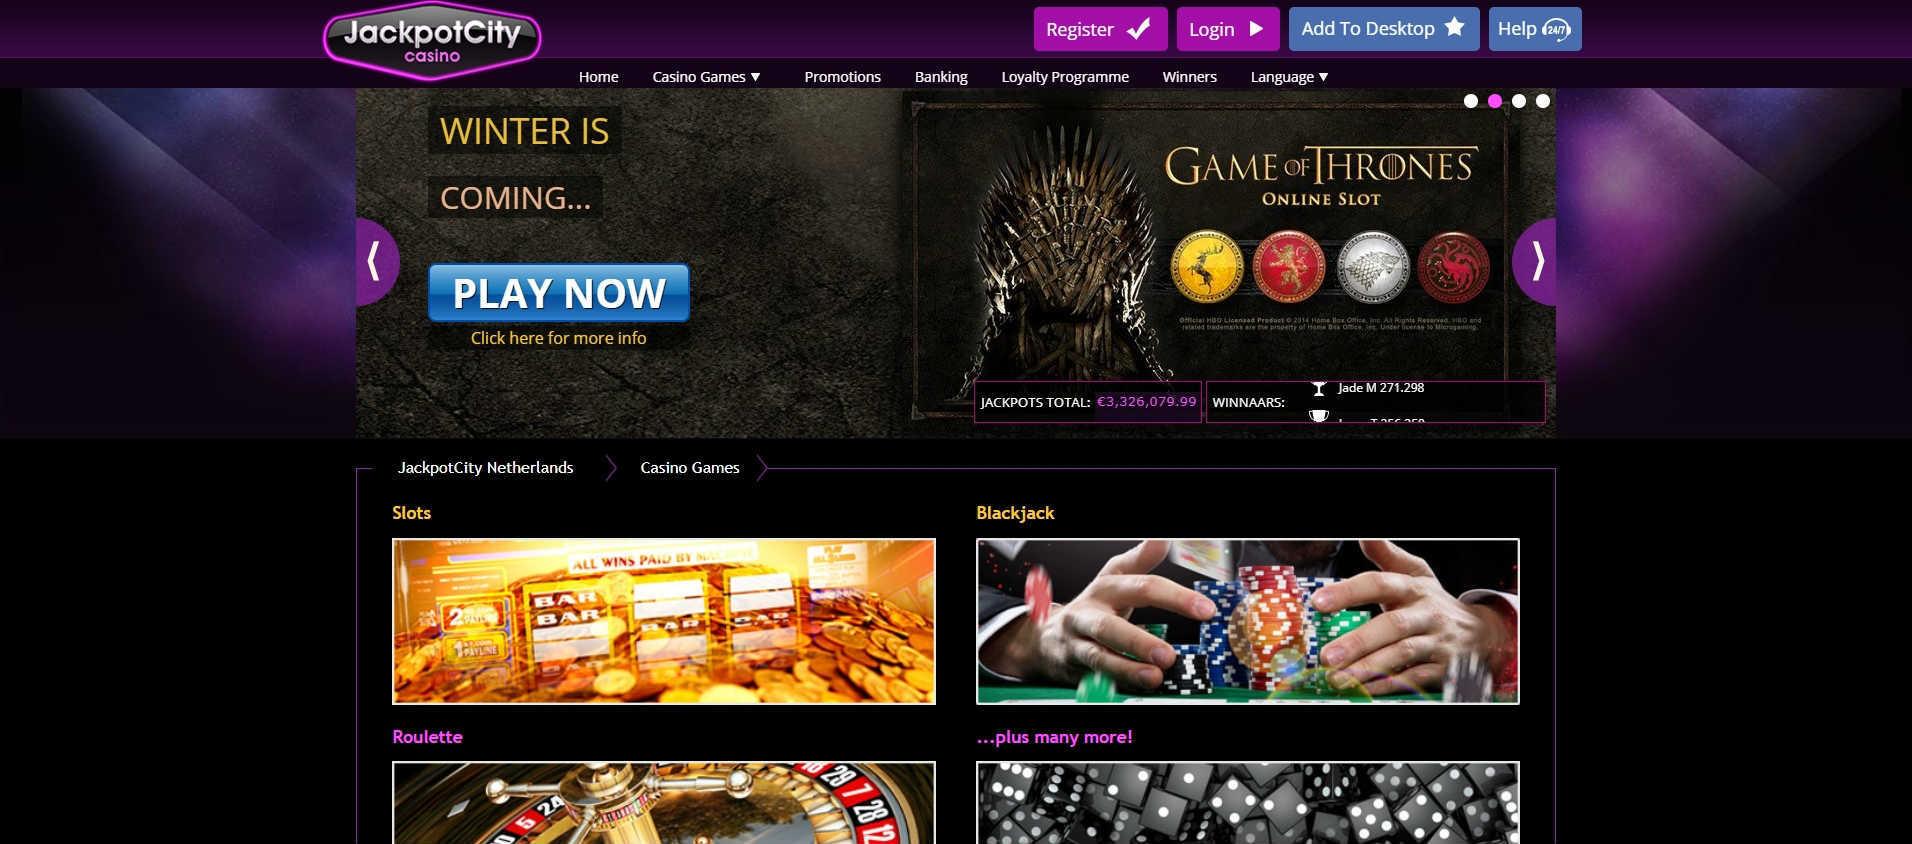 Jackpot City Casino Online Casino Games